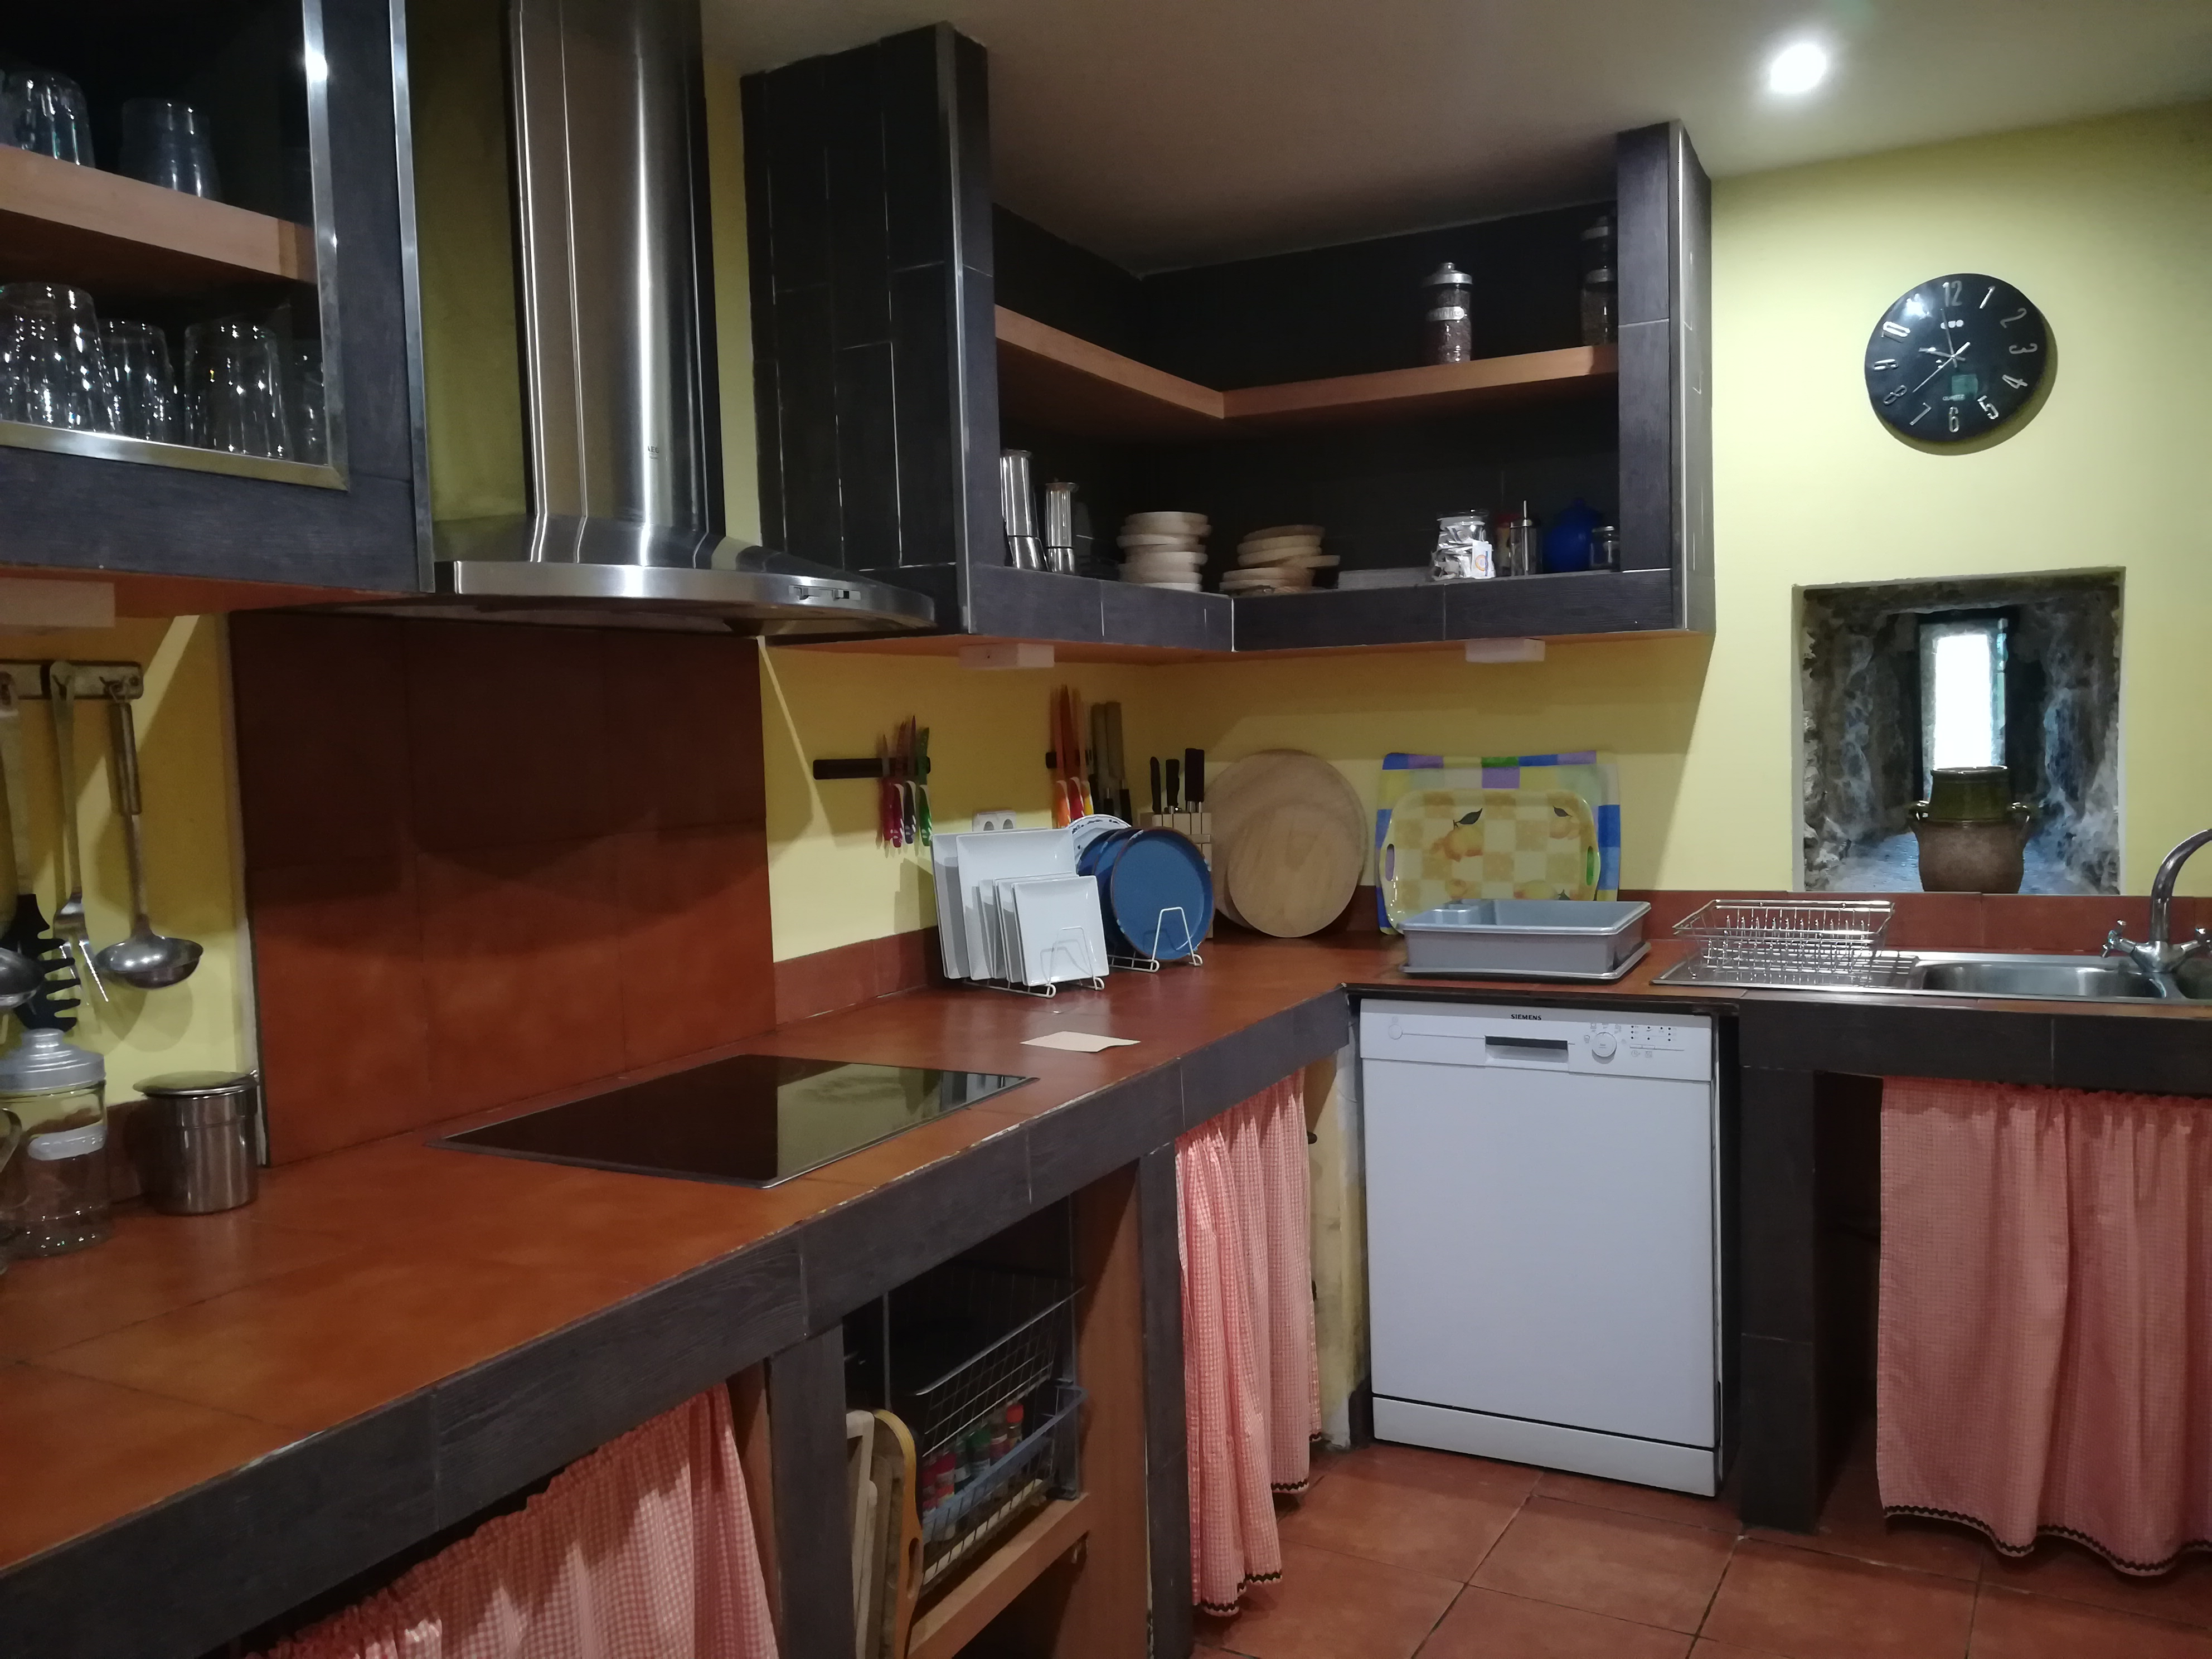 2018 06 vagalumes  cocina (5)